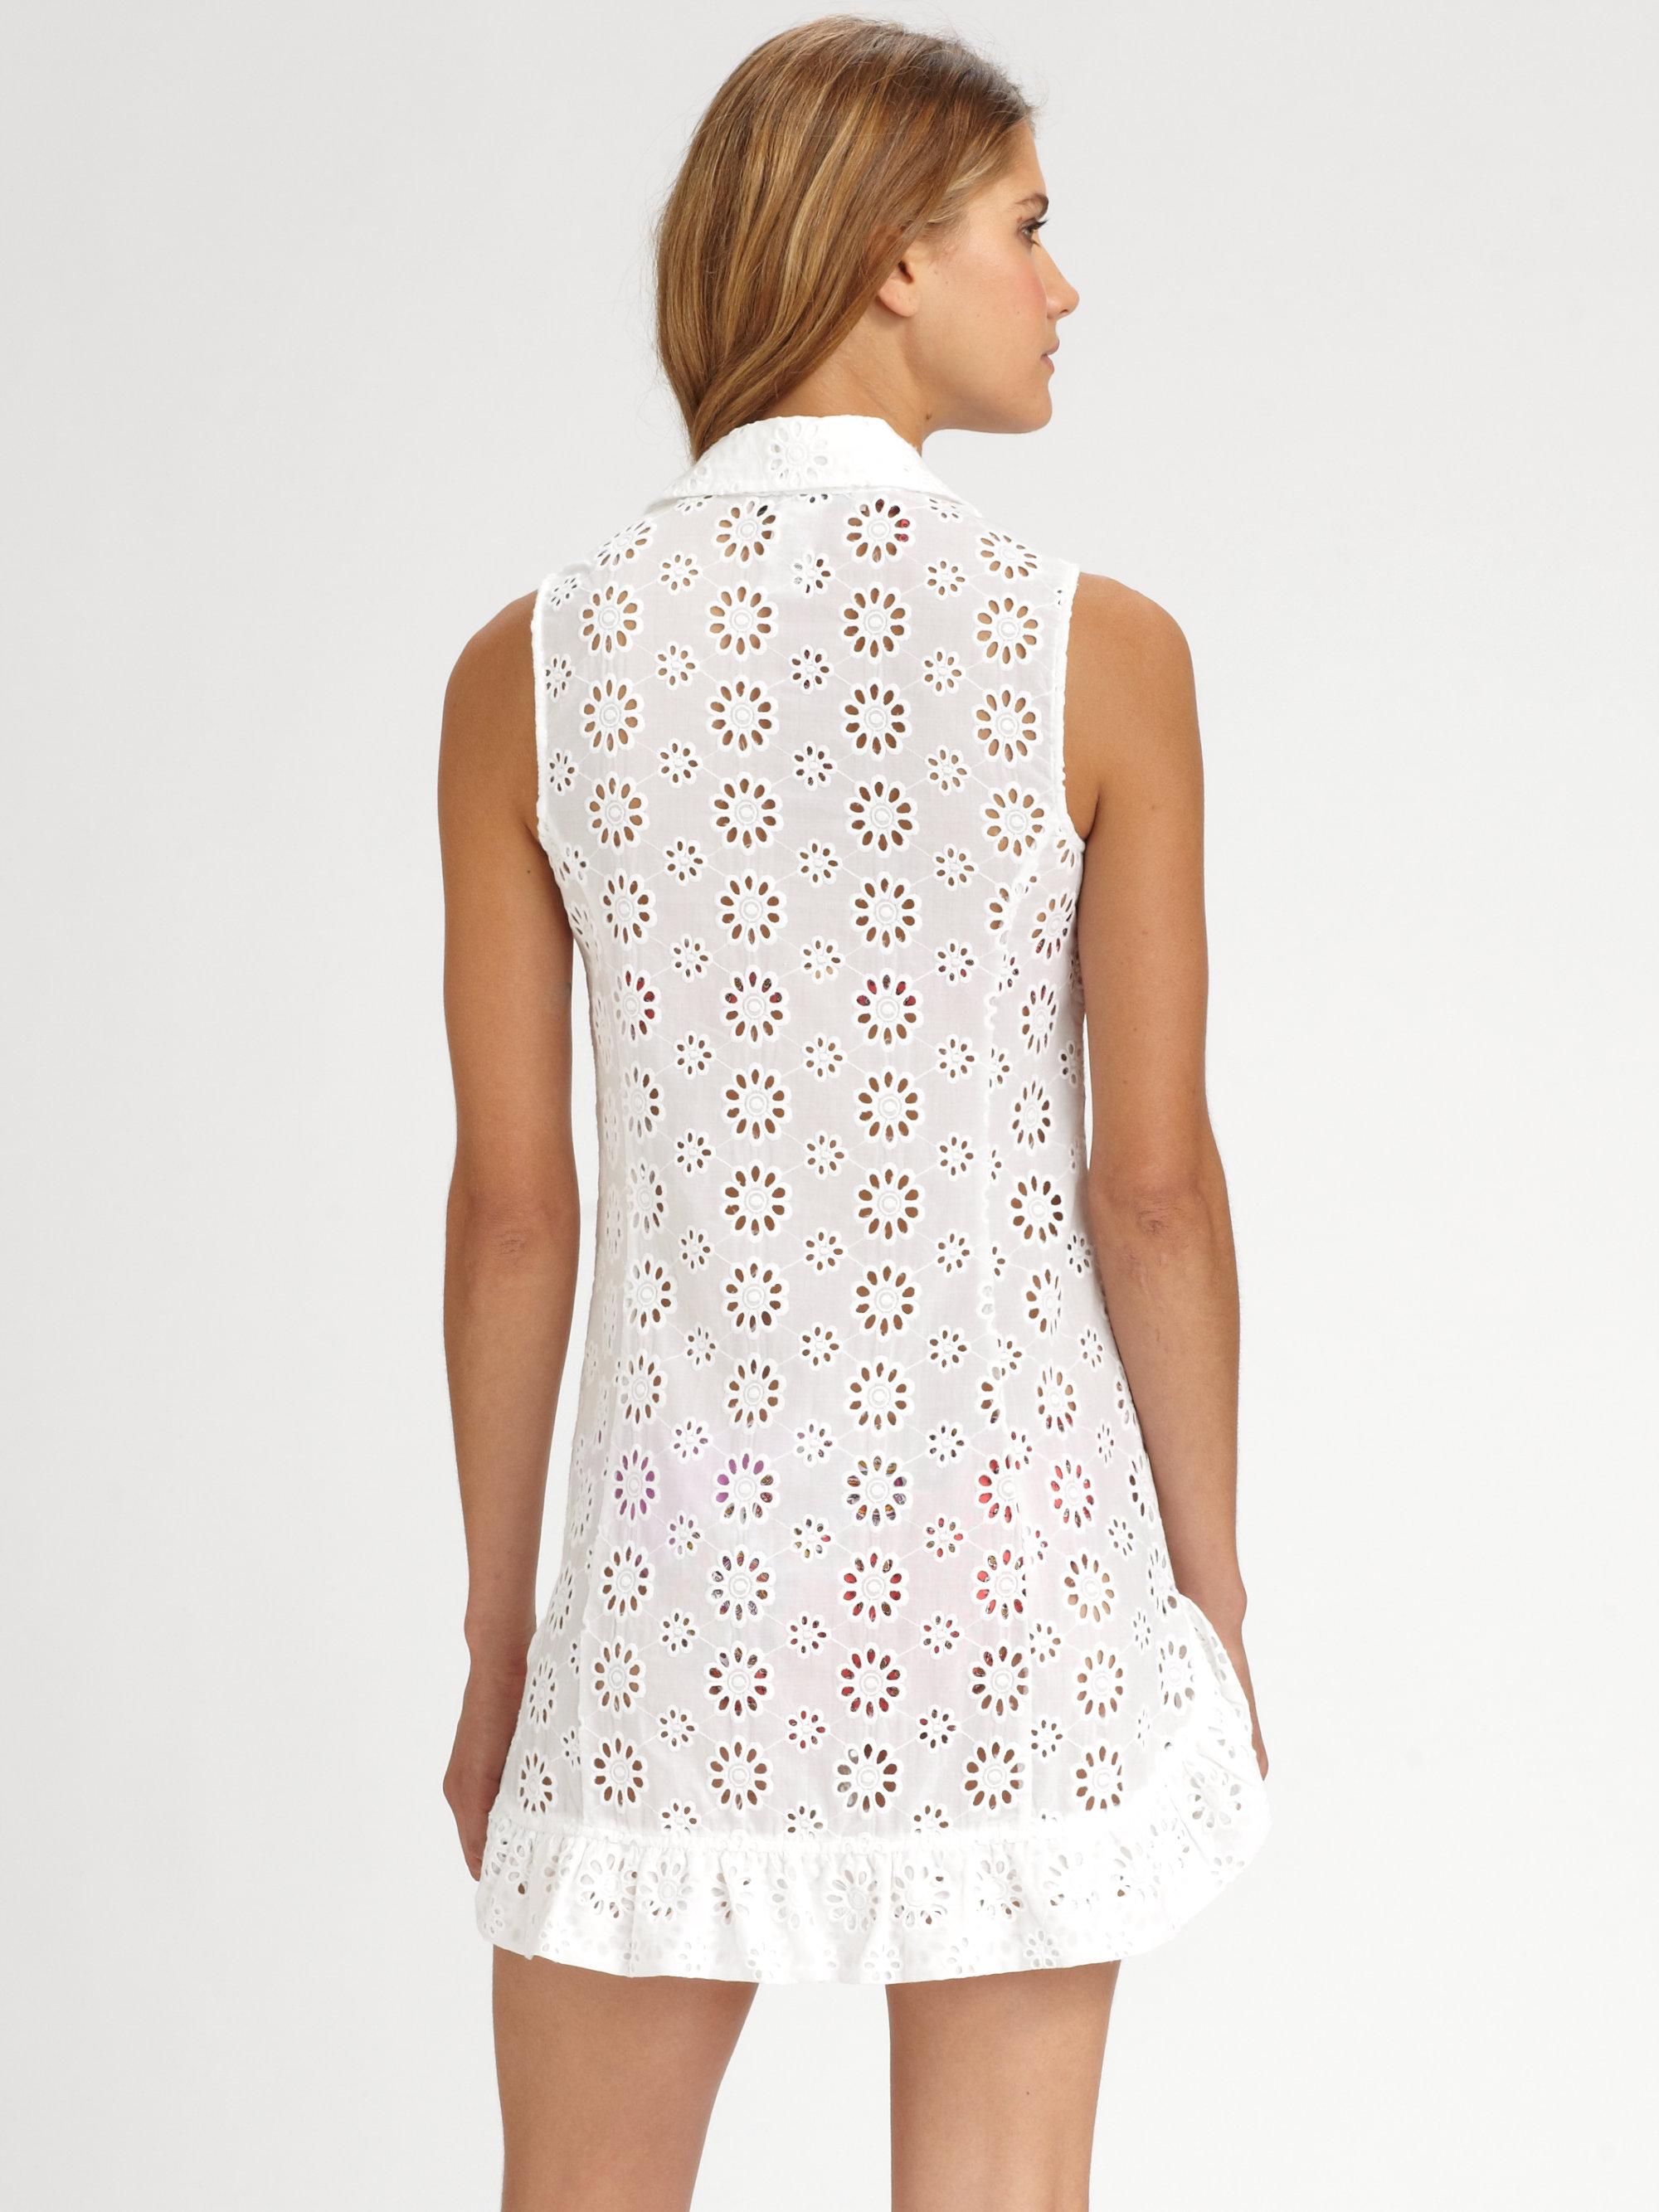 Nanette lepore Cotton Eyelet Tank Dress in White  Lyst